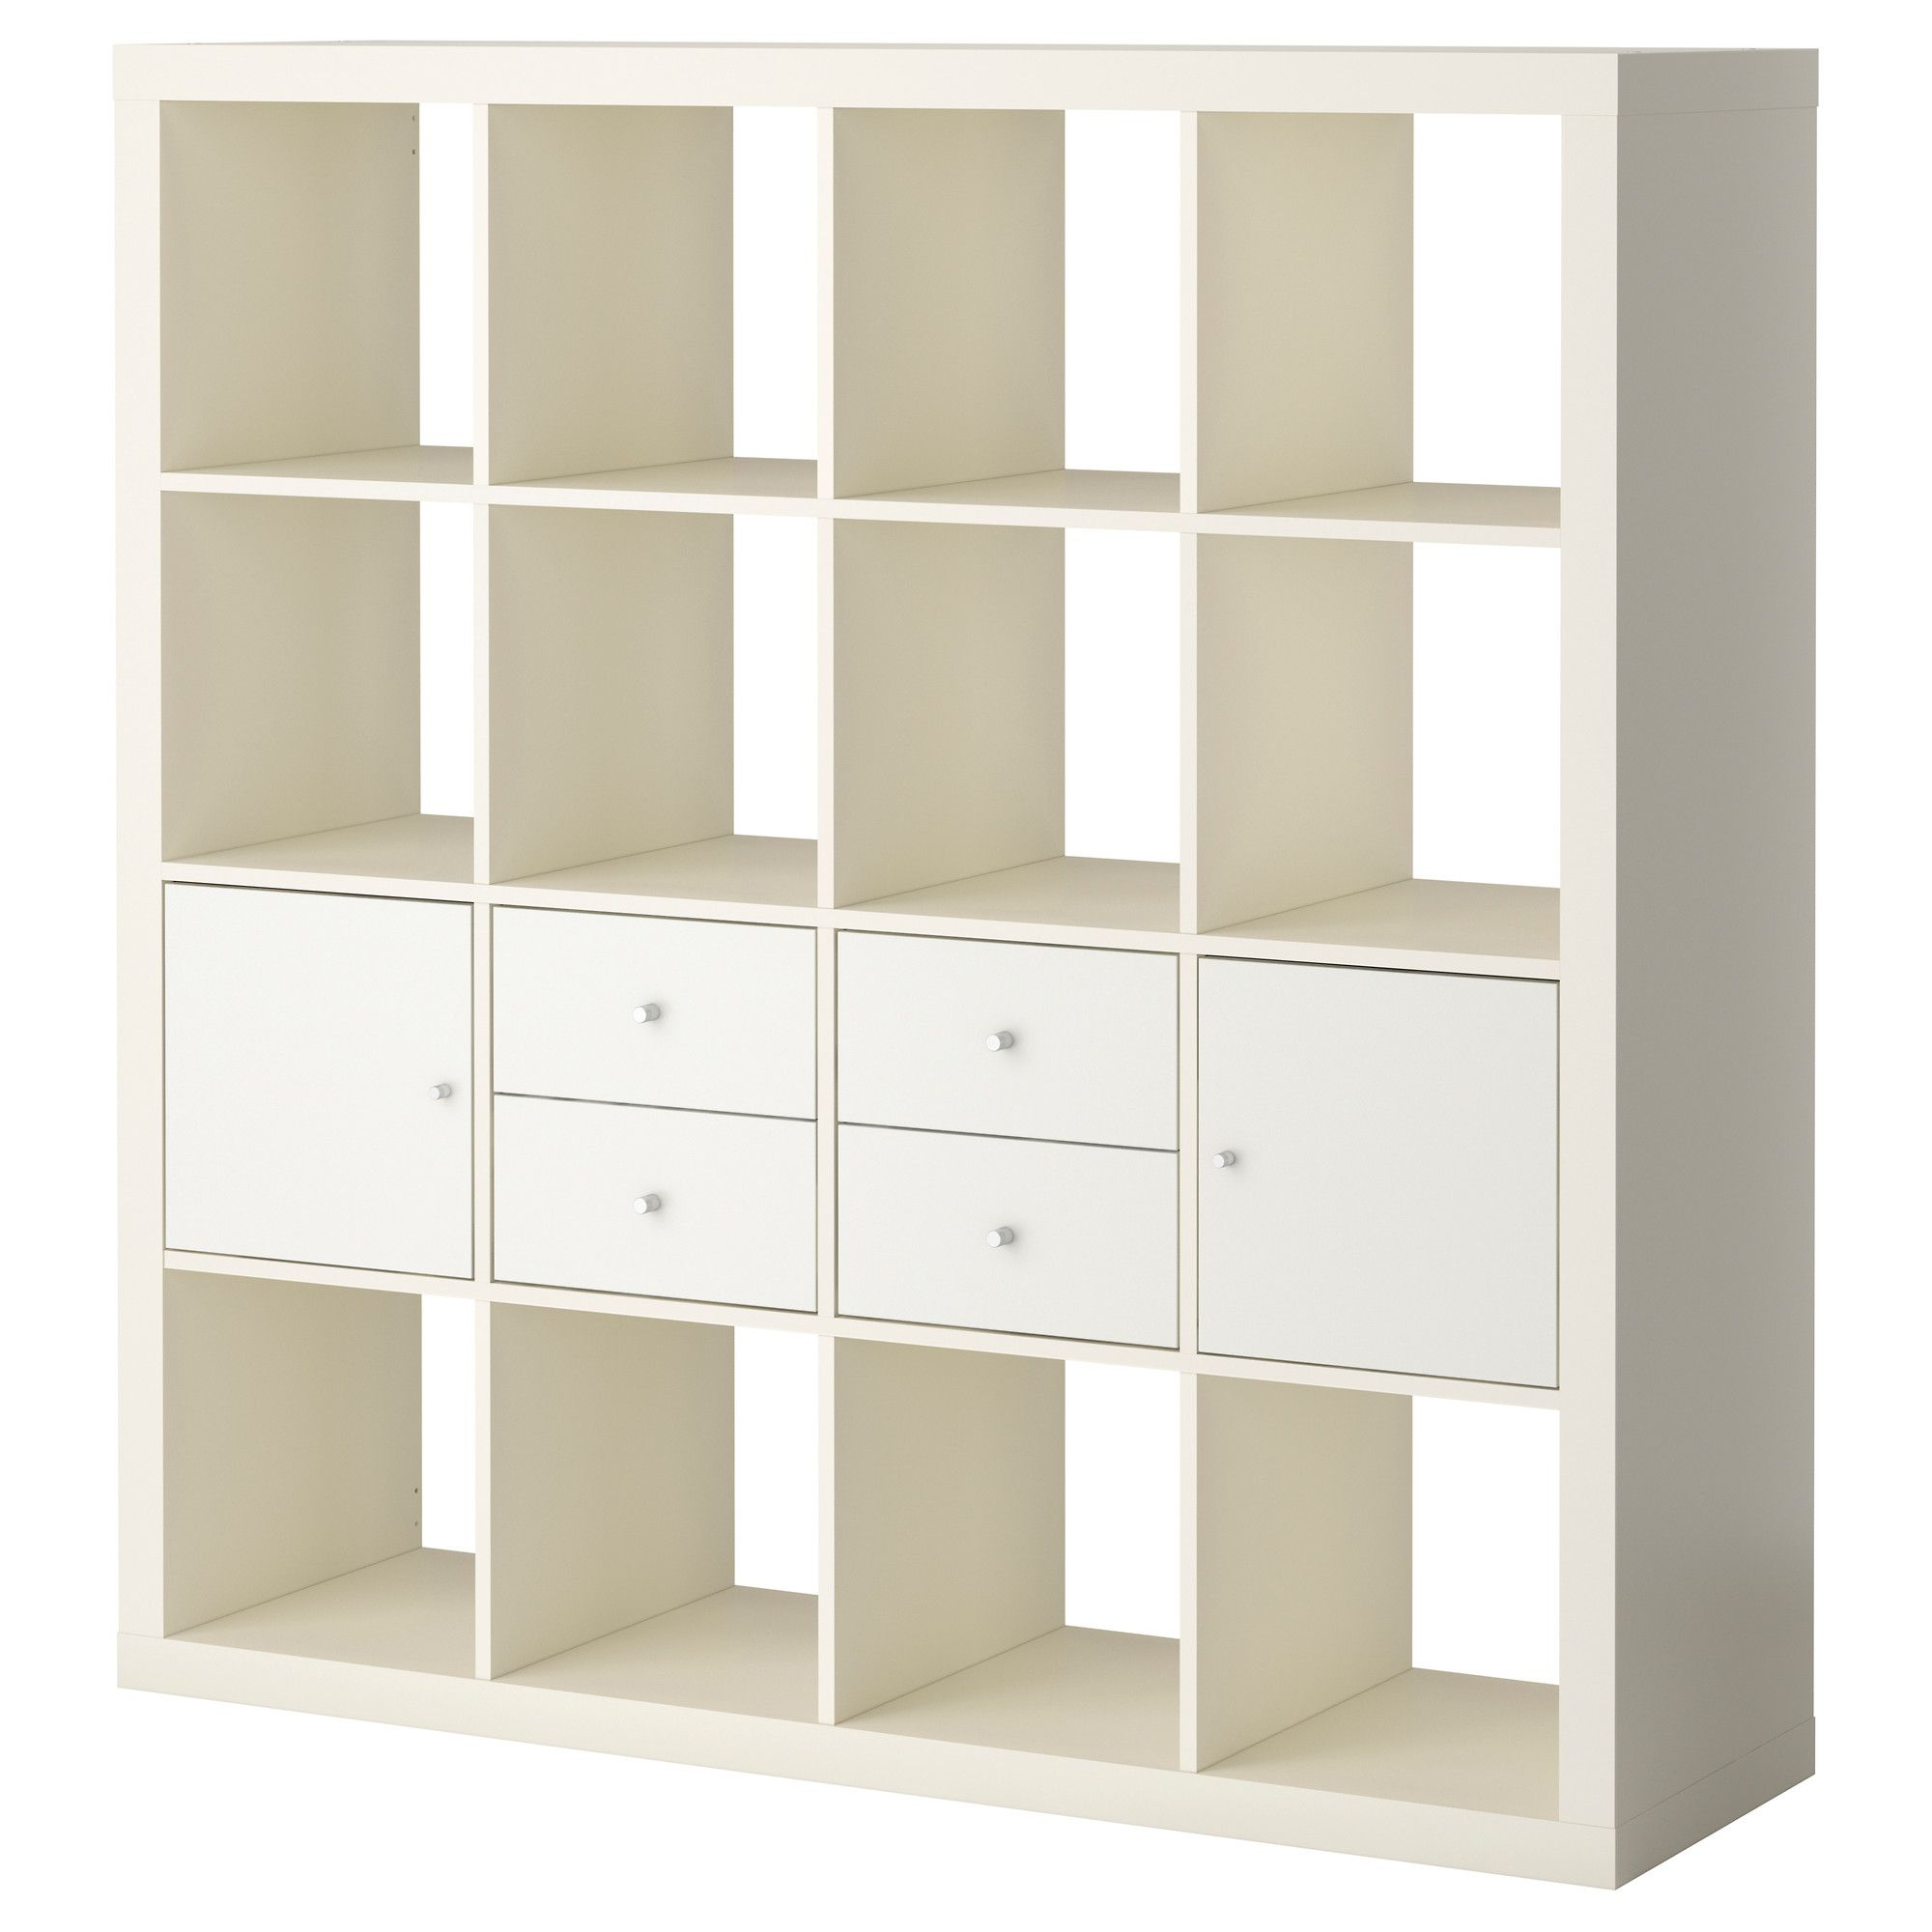 expedit storage combination w doors/drawers - white/white - ikea